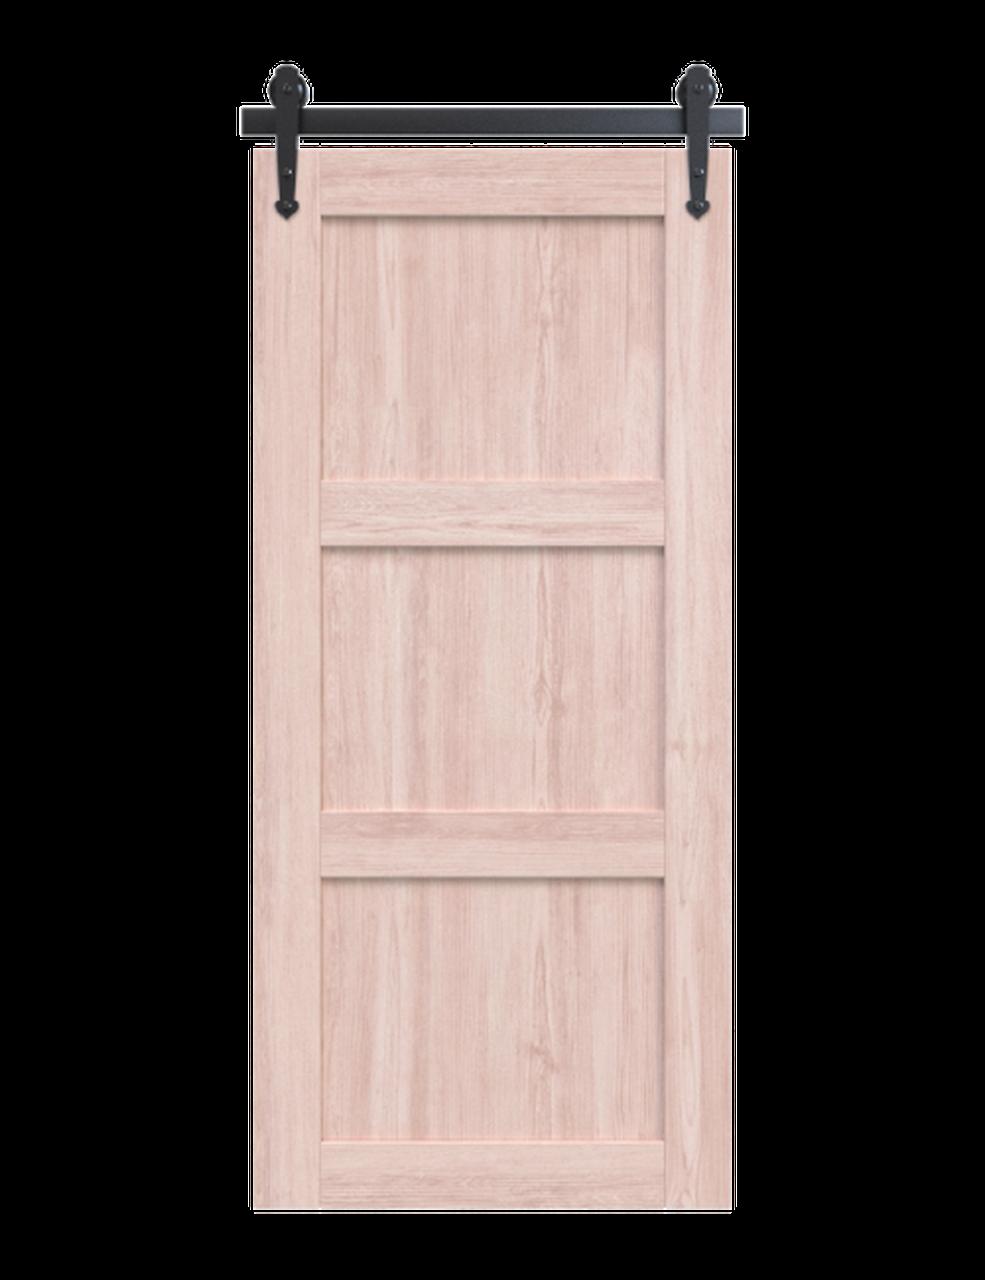 wood white washed 3 panel shaker barn door (Minwax Simply White)